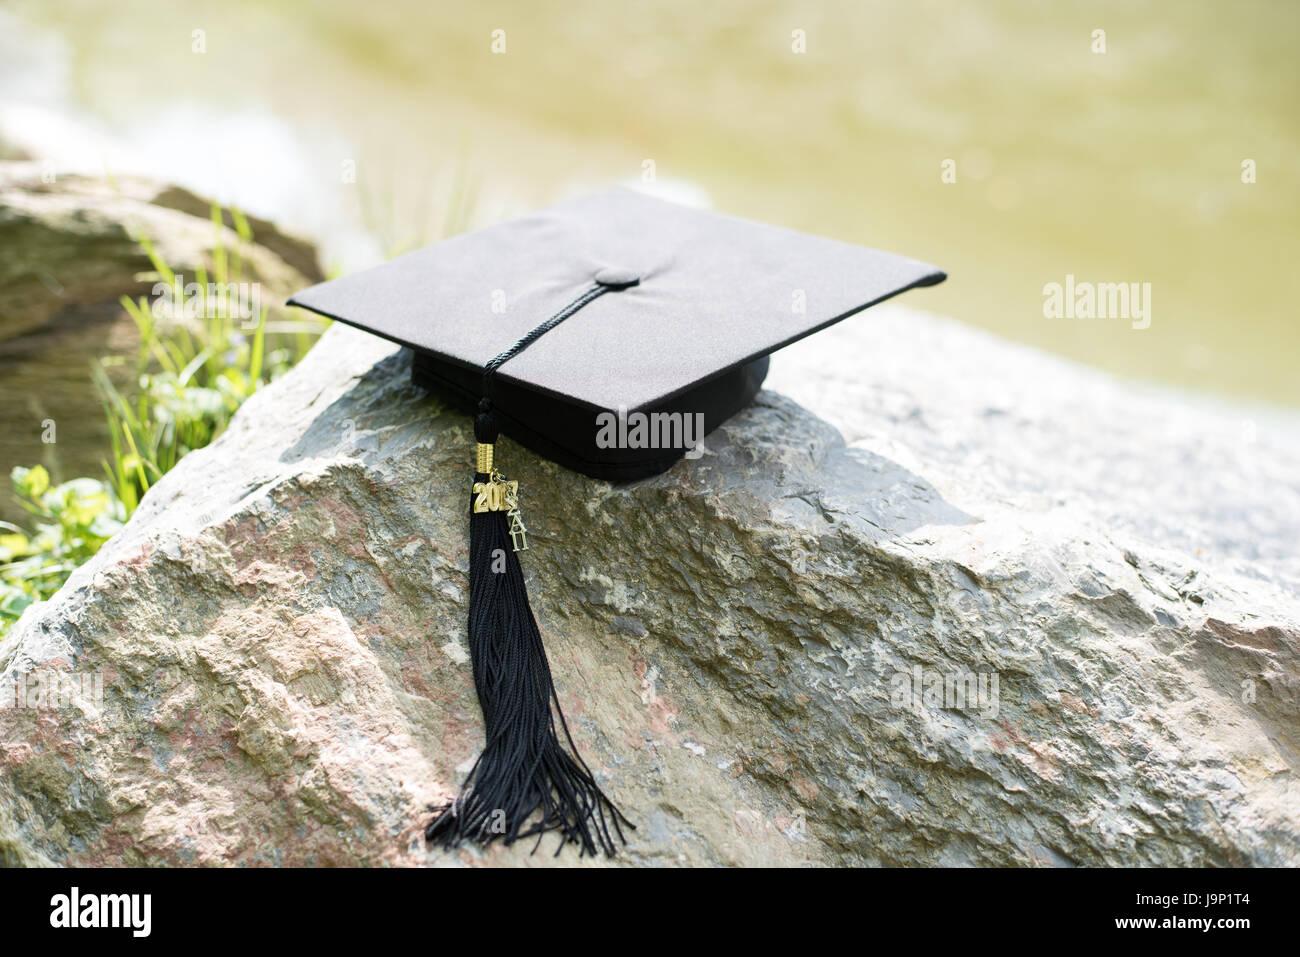 Graduation Cap on Rock - Stock Image